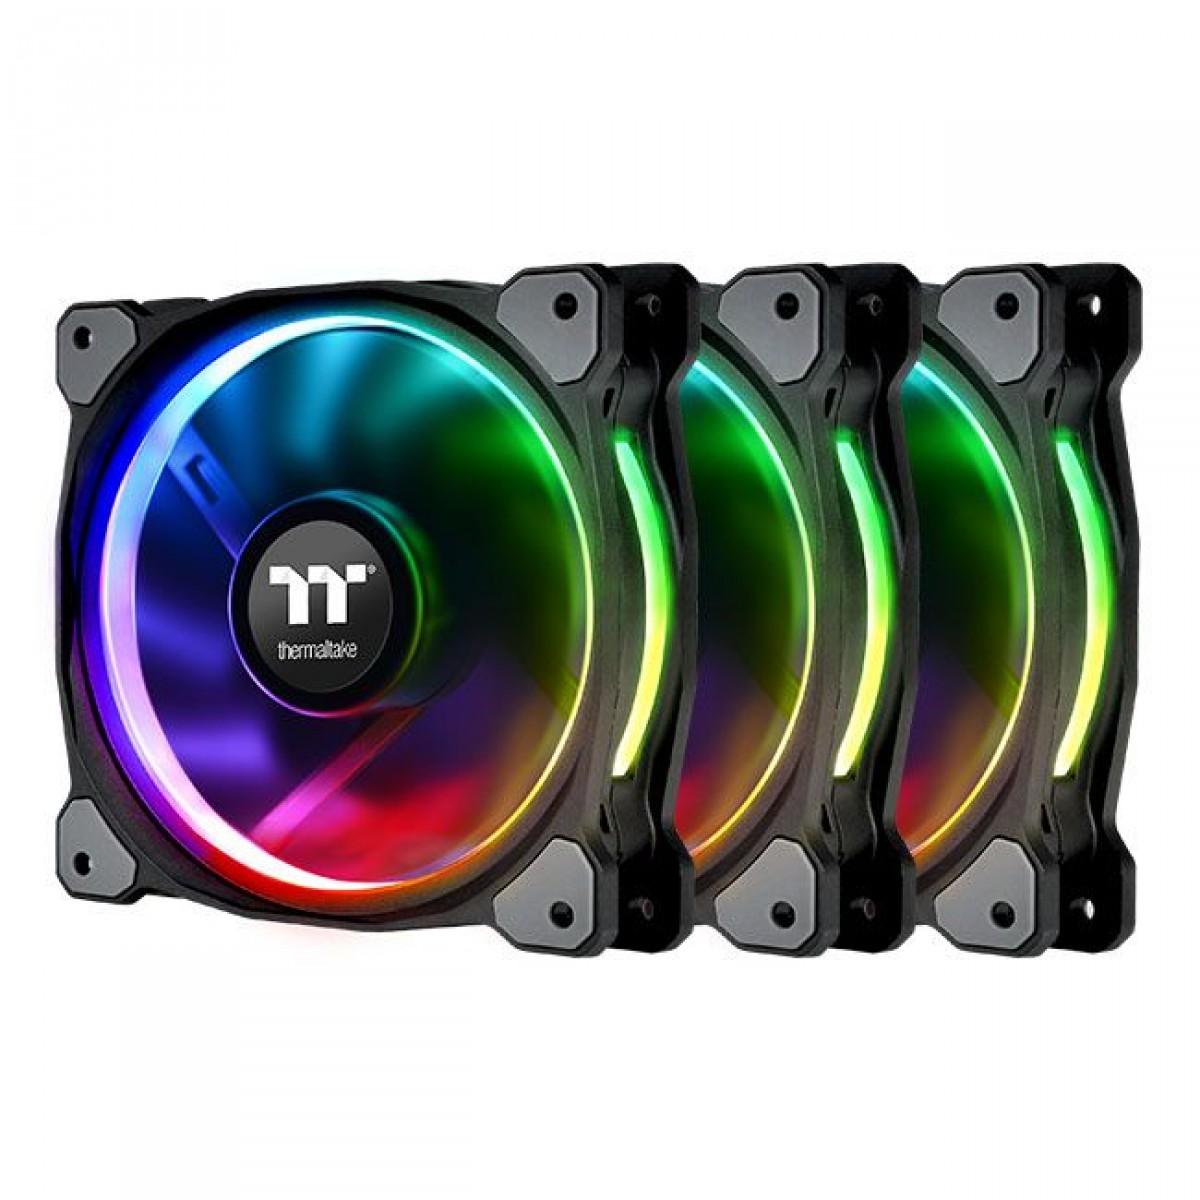 Kit Fan com 3 Unidades Thermaltake Riing Plus 14 RGB Radiator TT Premium Edition, 140mm, Black, CL-F056-PL14SW-A